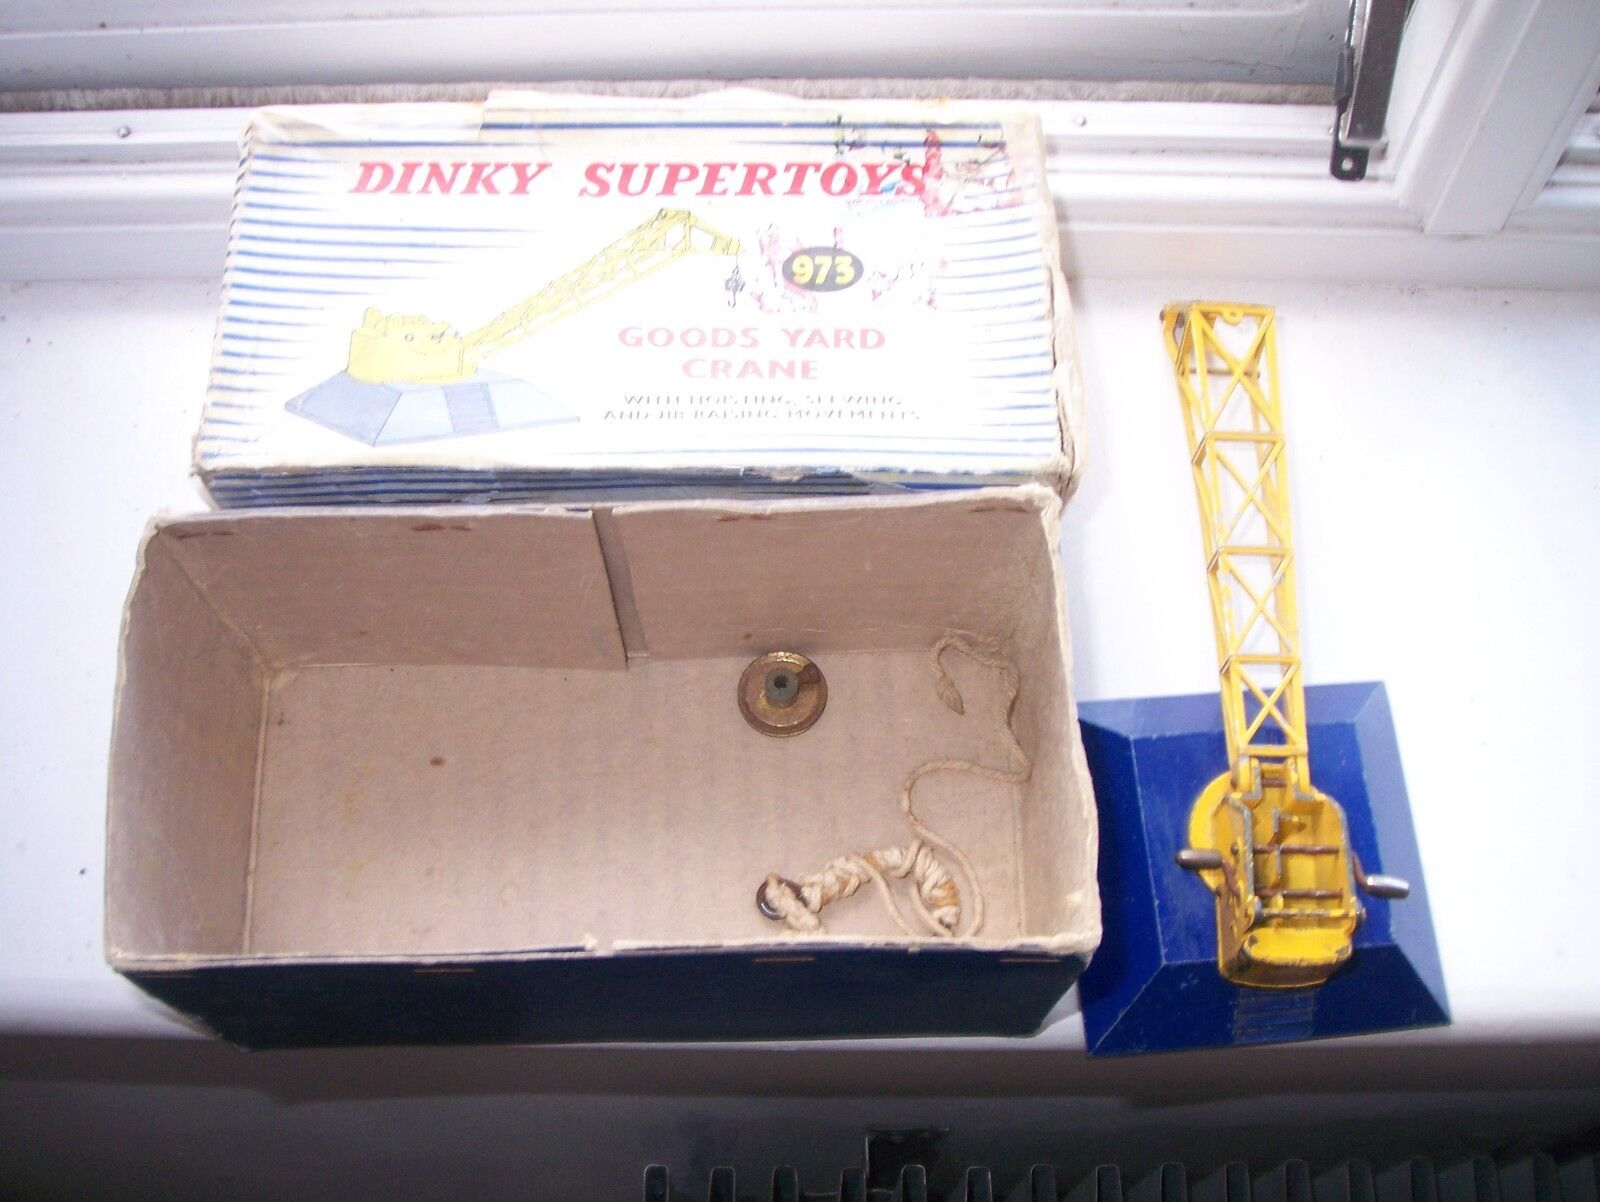 Dinky 973 SUPER TOYS marchandises Yard CRANE-Coffret